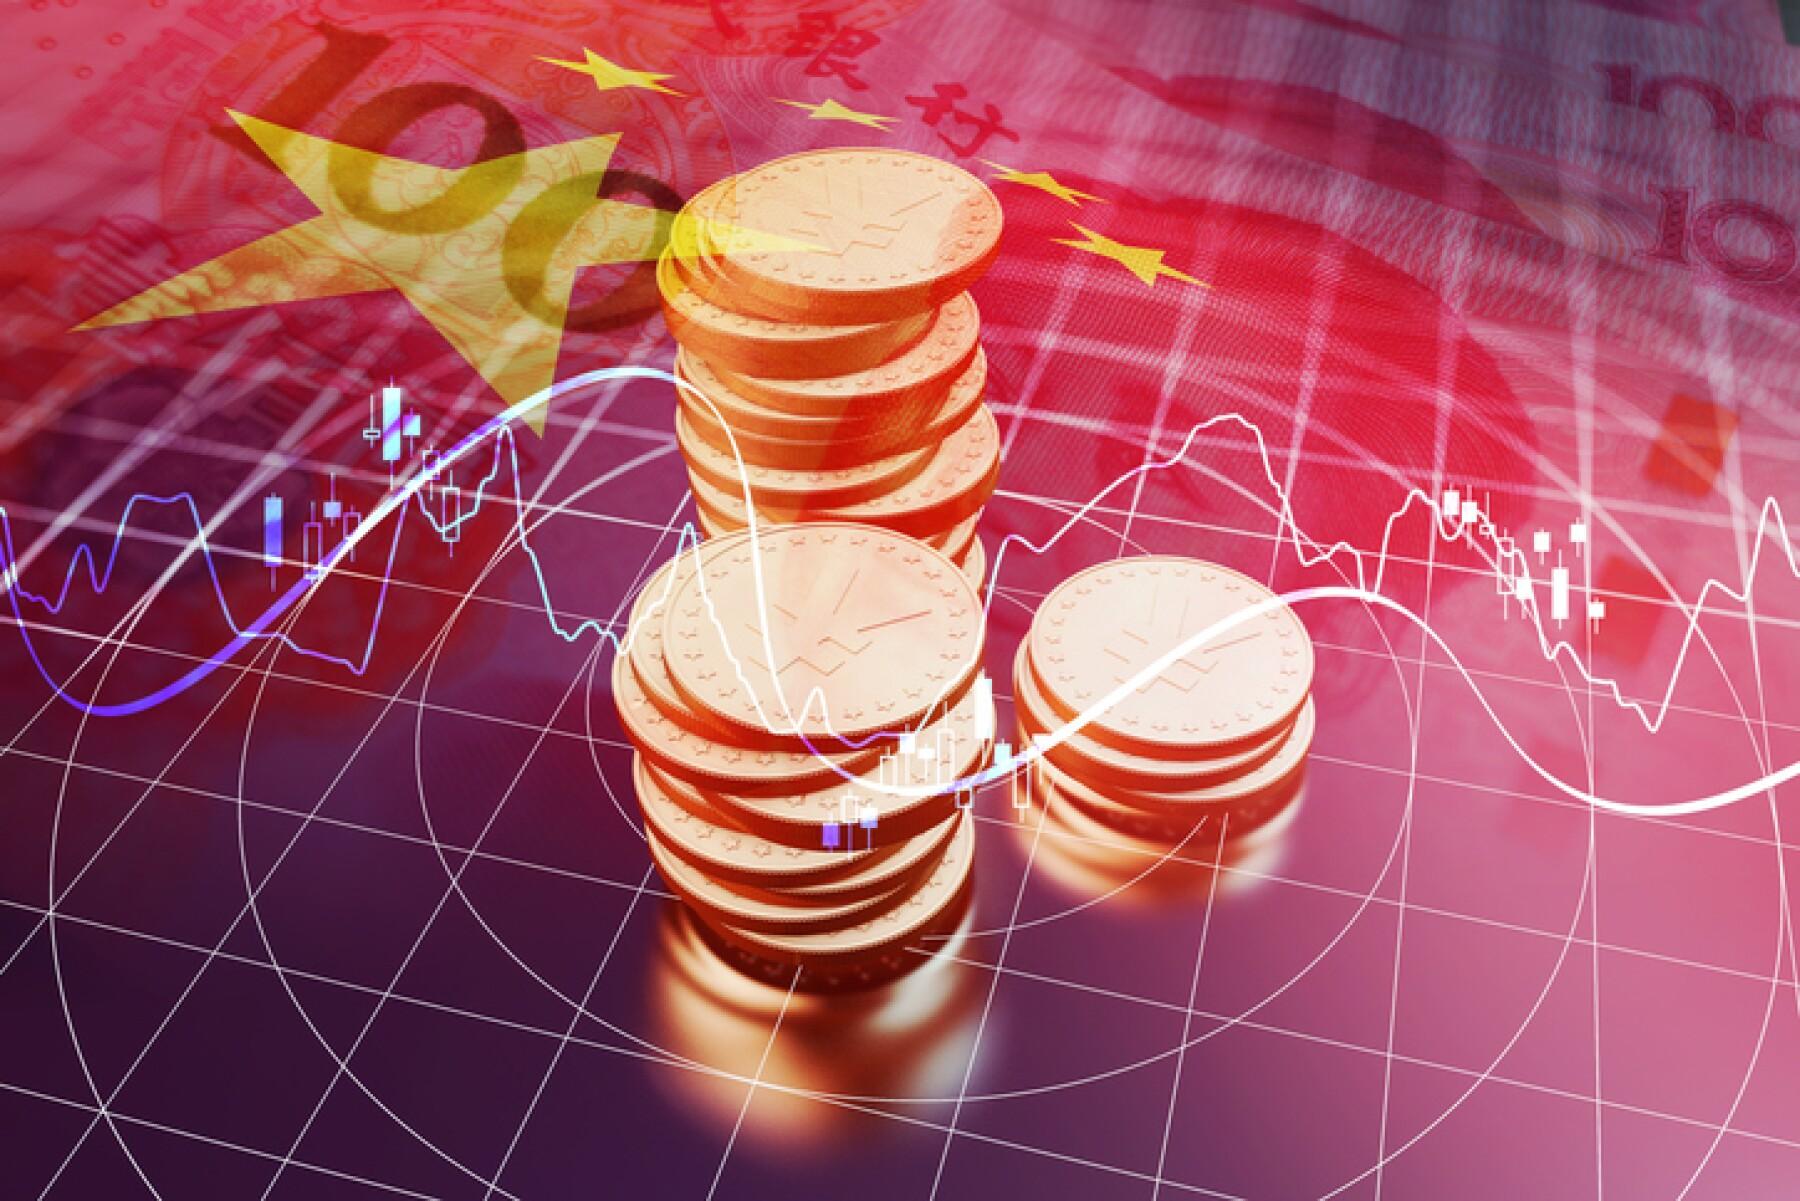 China 's economic and financial stock market data